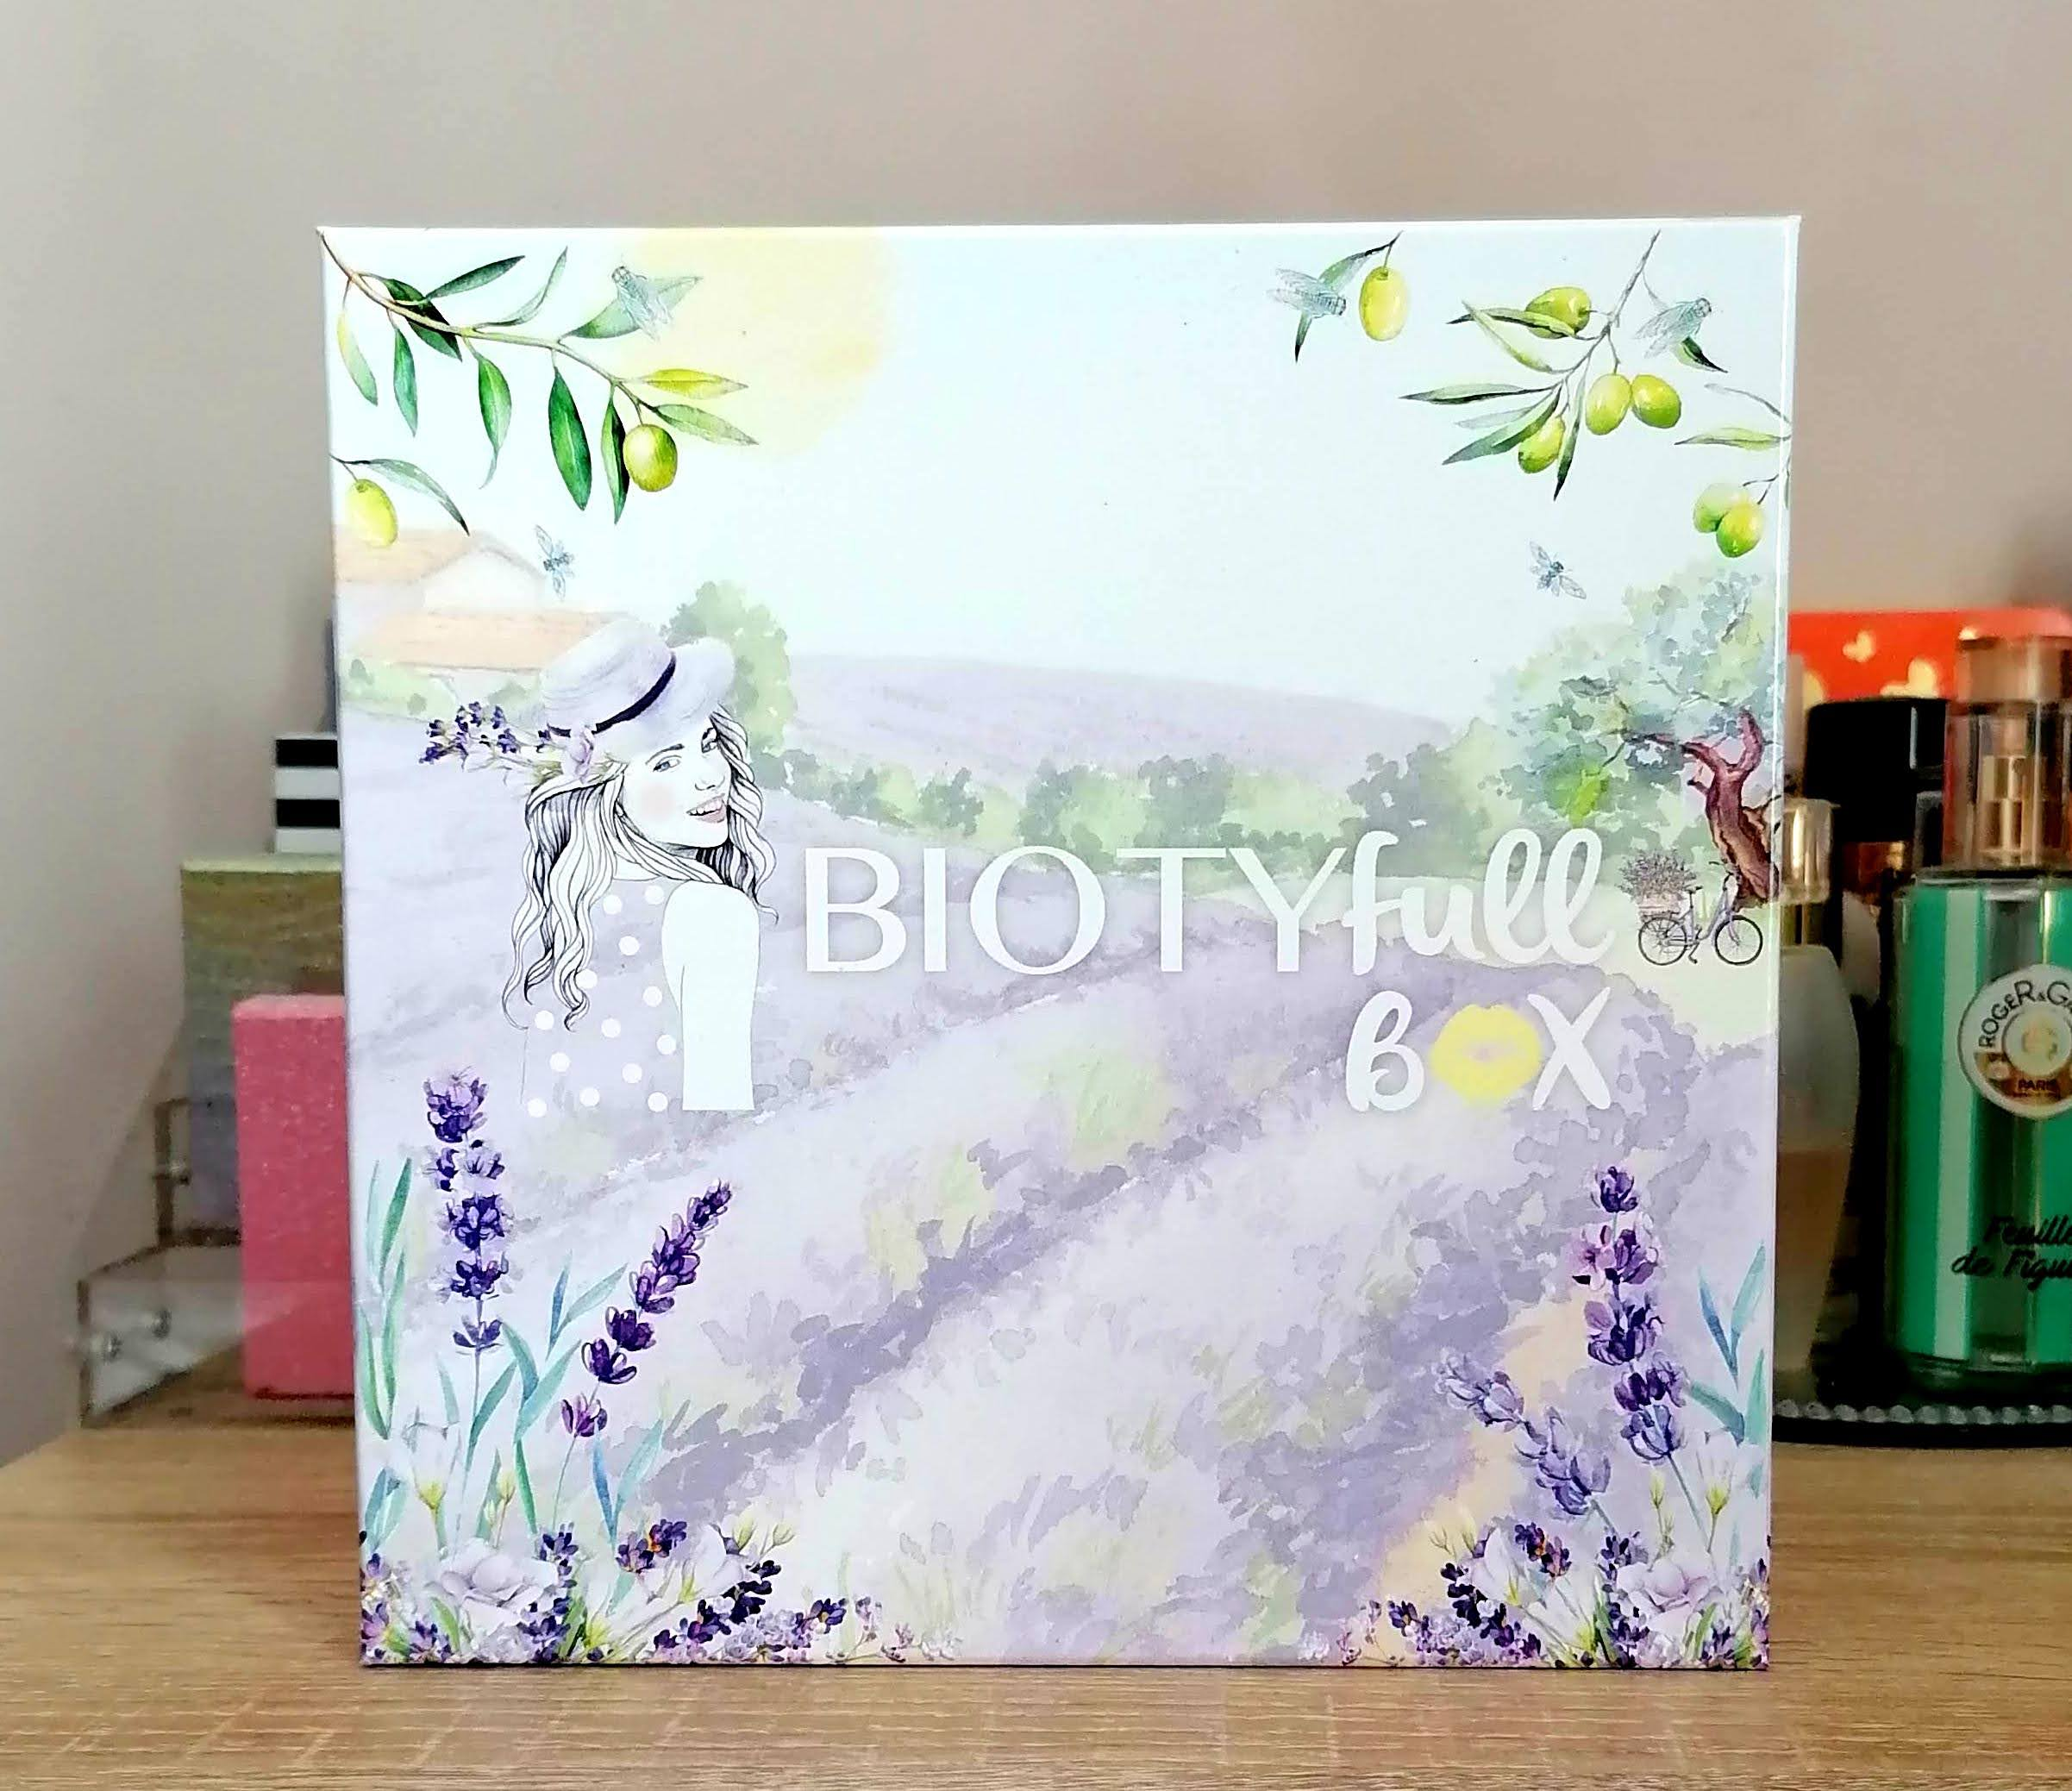 BIOTYFULL BOX Mai 2020 : La Provençale!